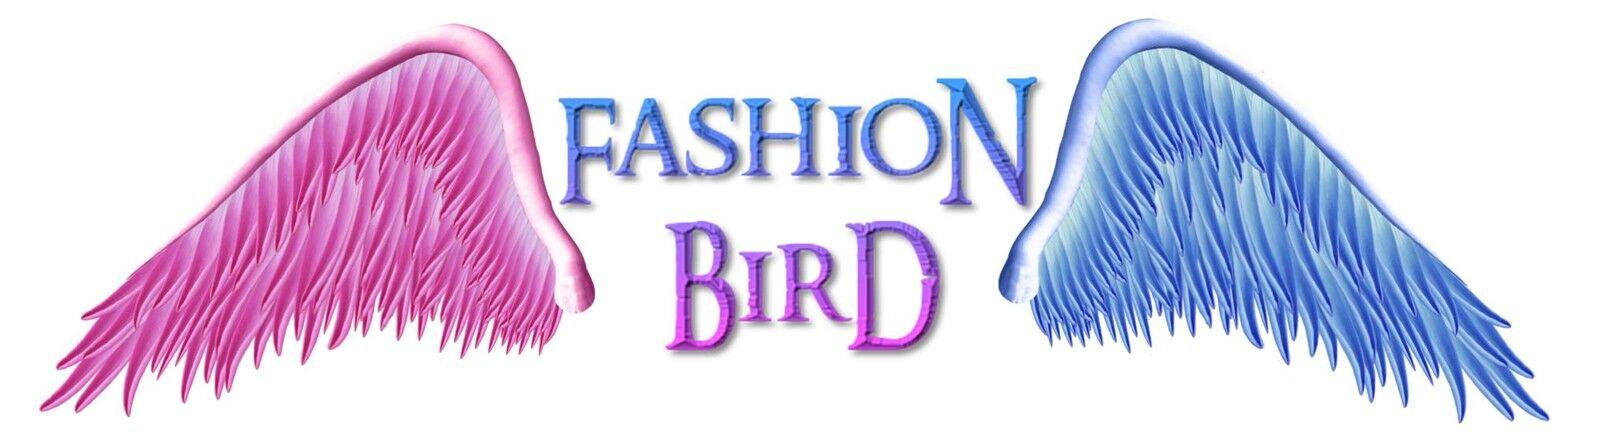 Fashion-Bird-15